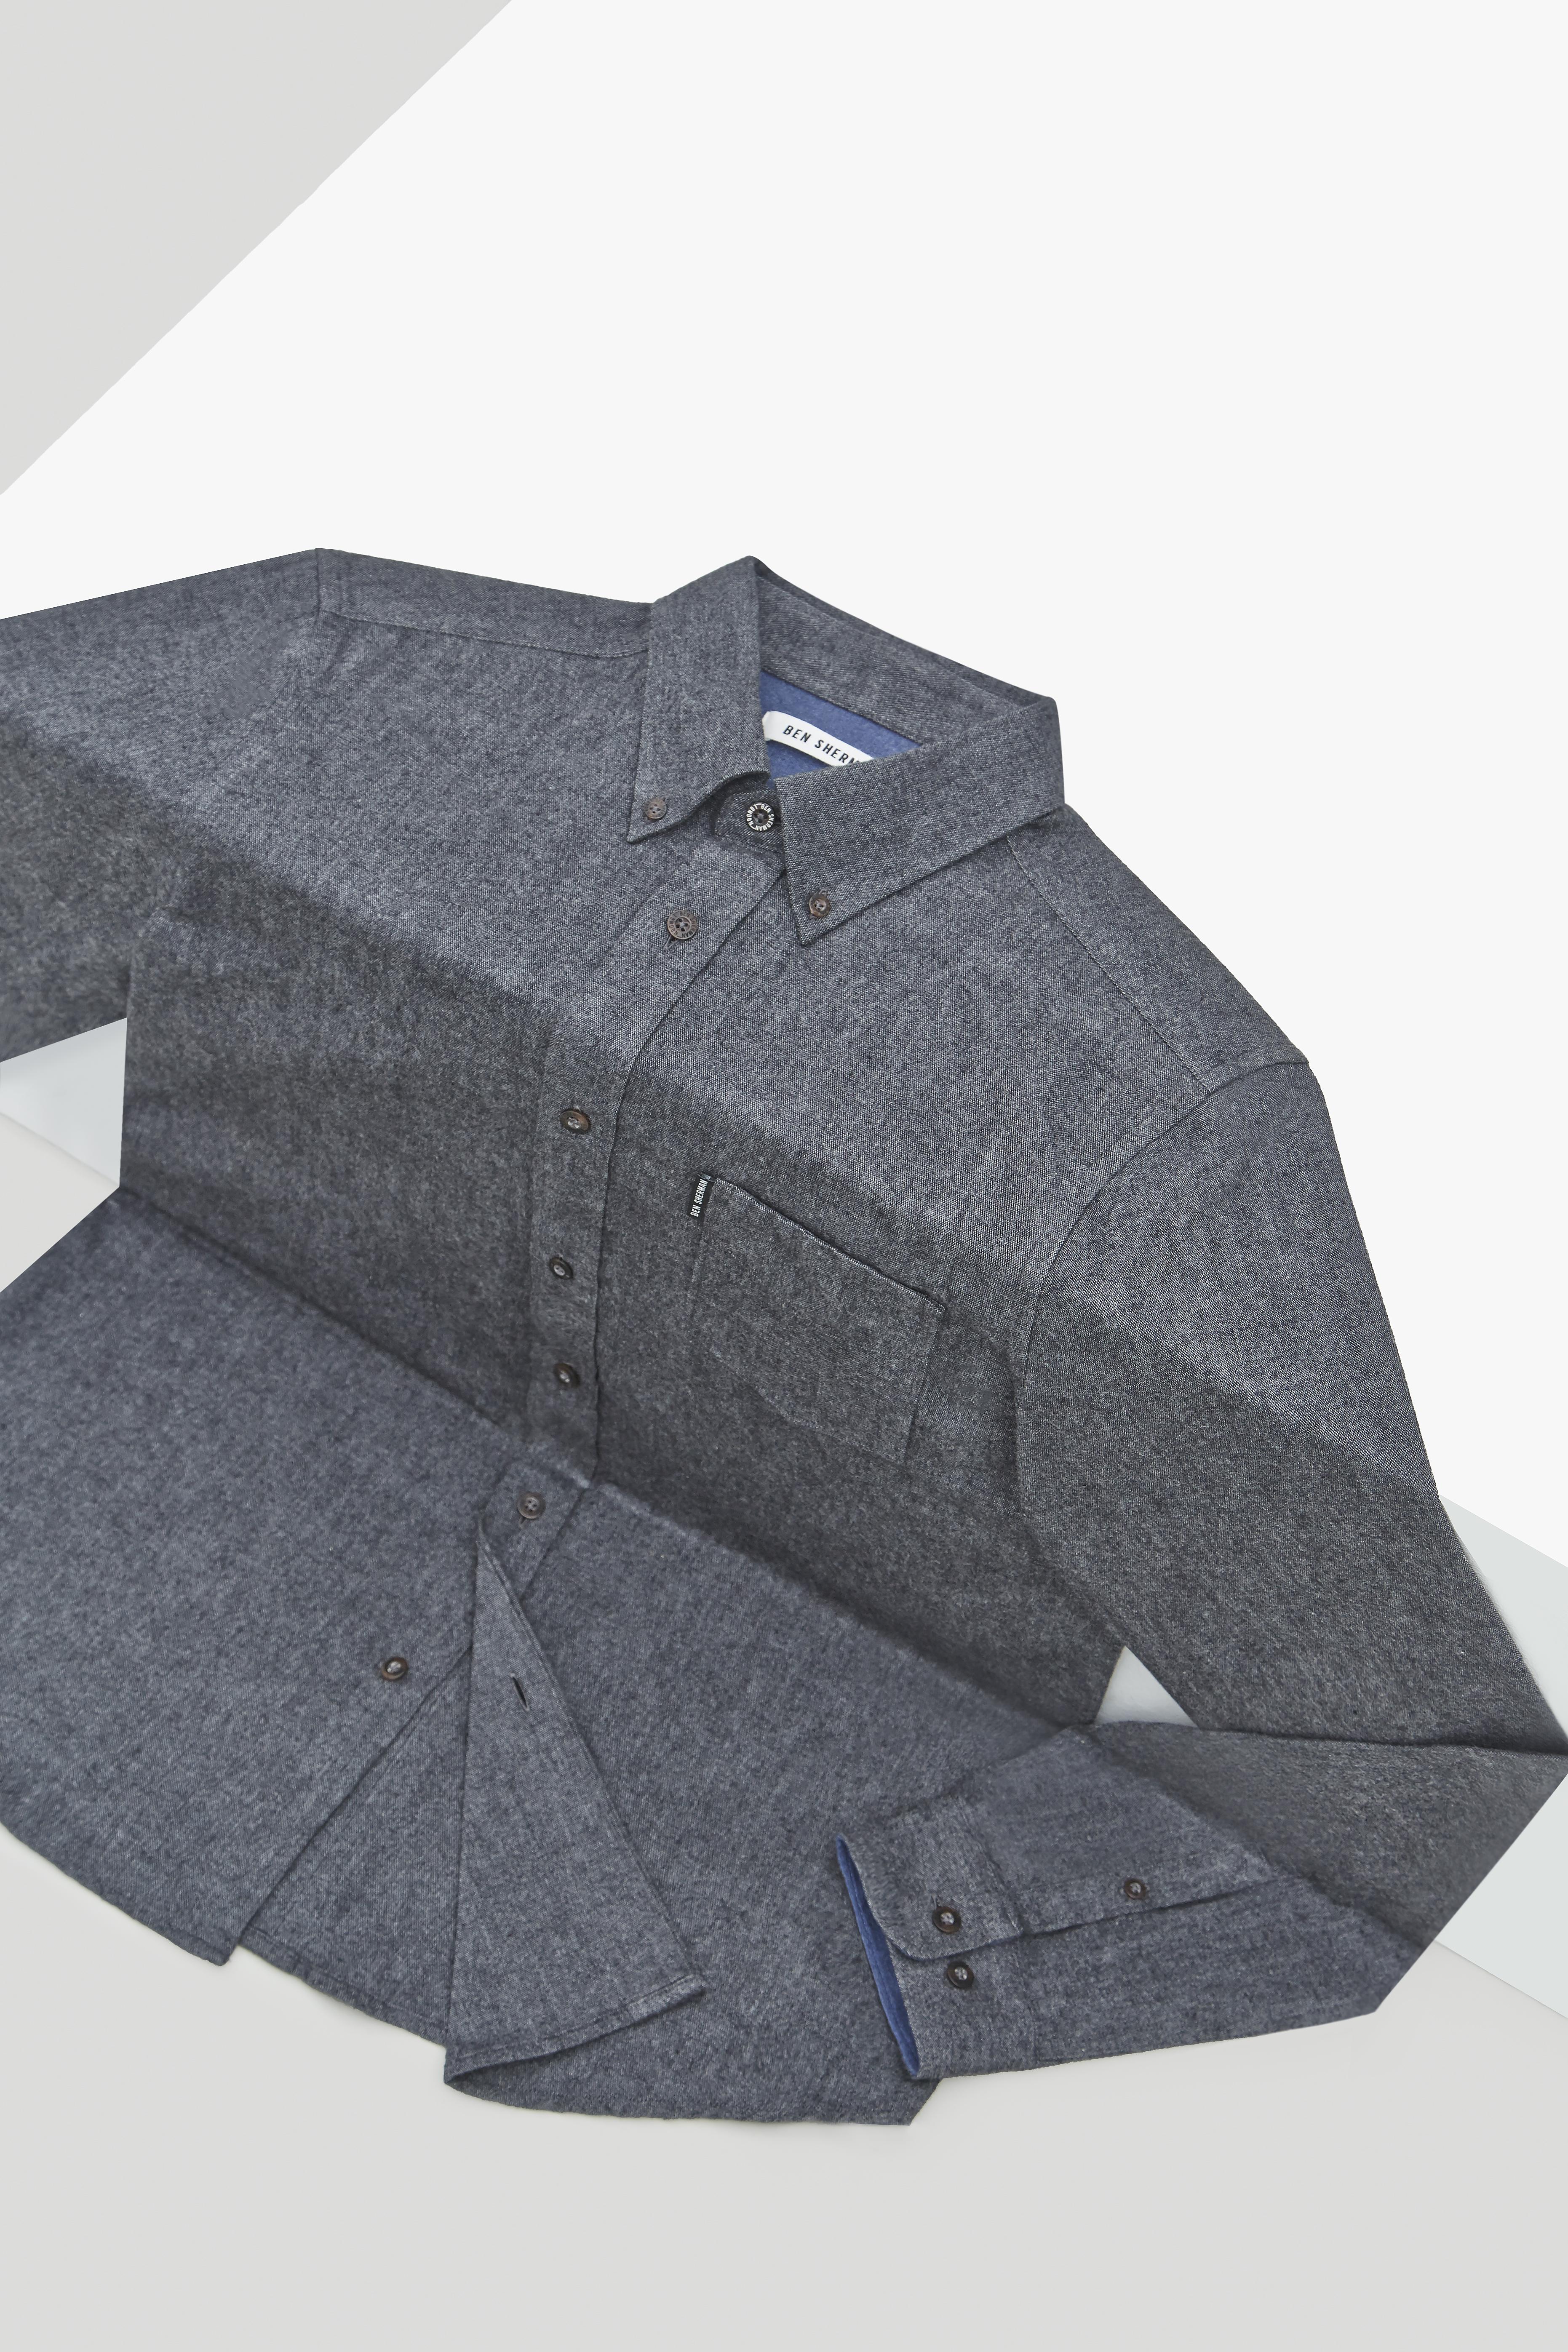 Wk 41_MW_Smart Shirts